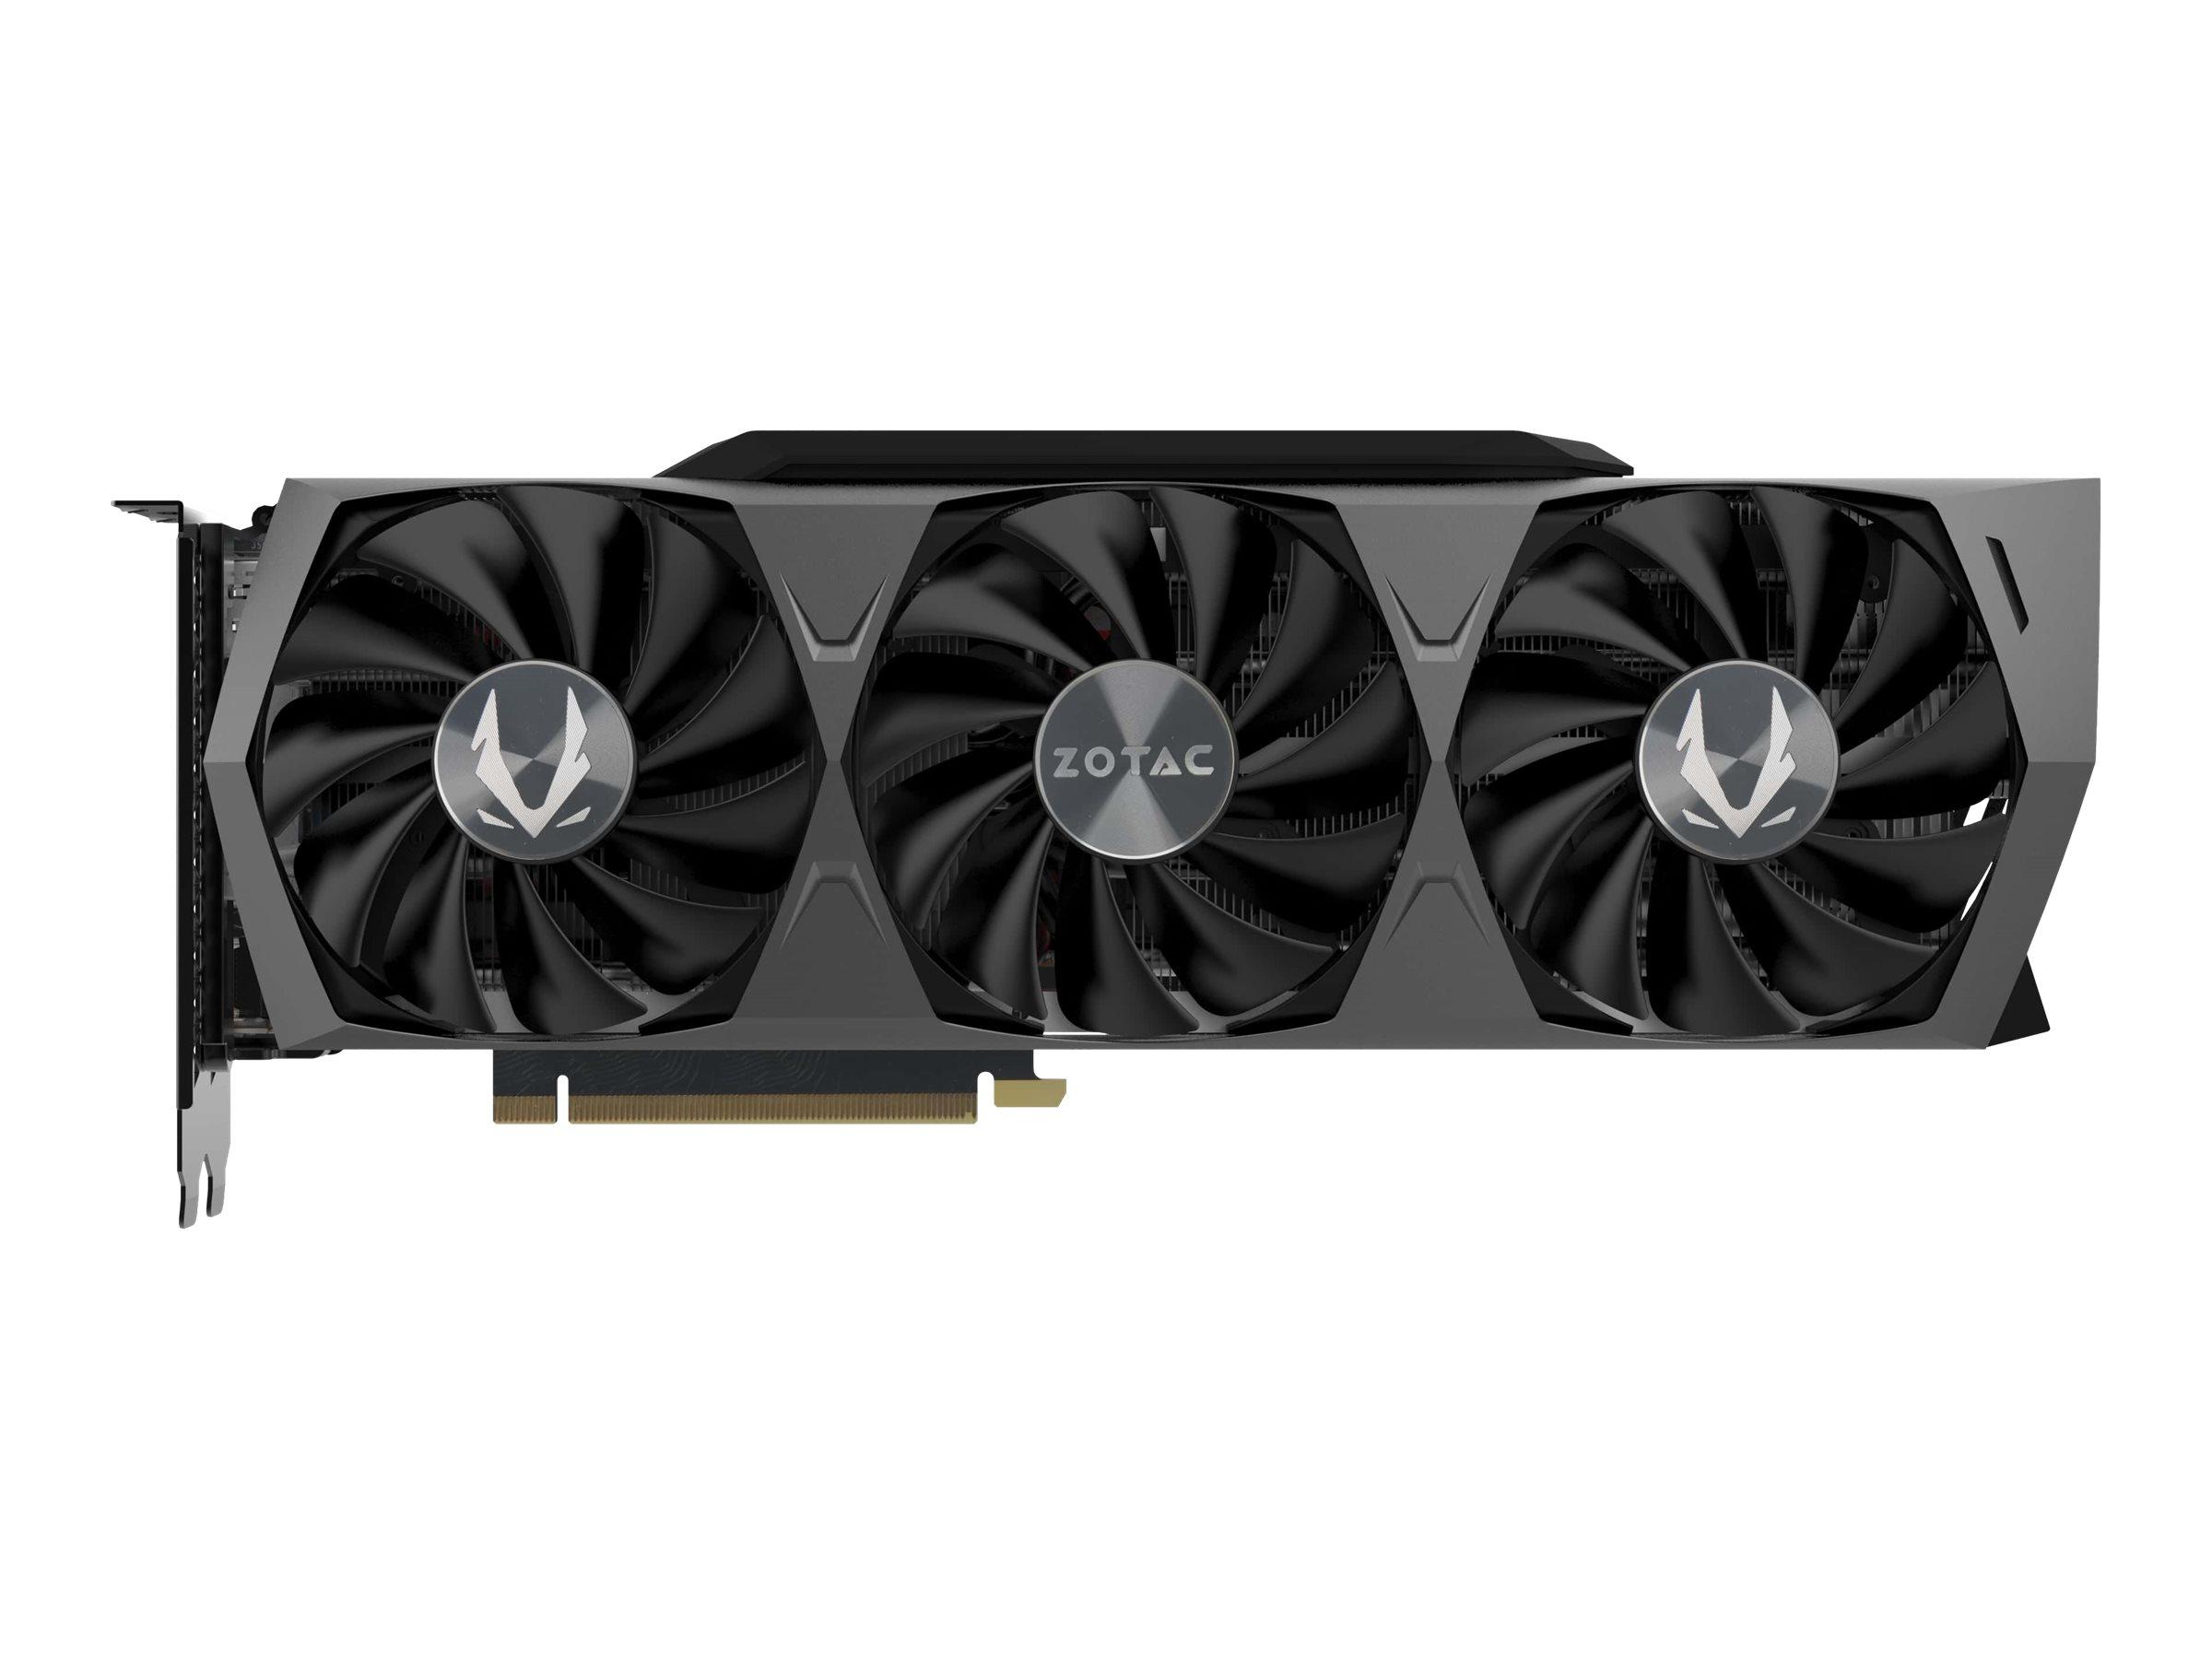 ZOTAC GAMING GeForce RTX 3080 Ti Trinity OC - Grafikkarten